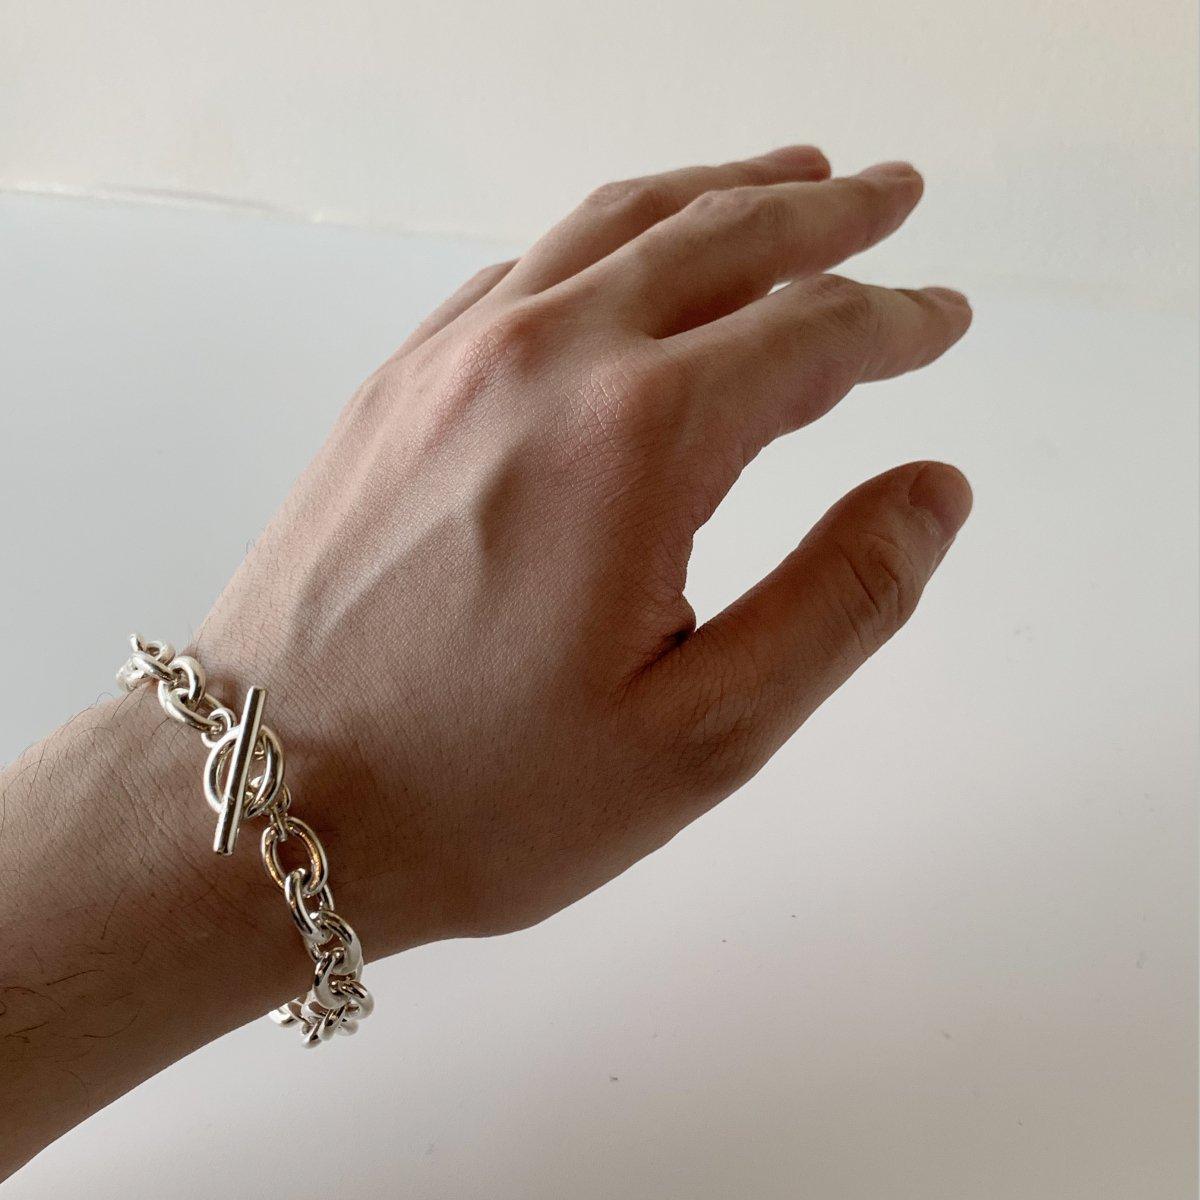 vo chain bracelet S -mens-